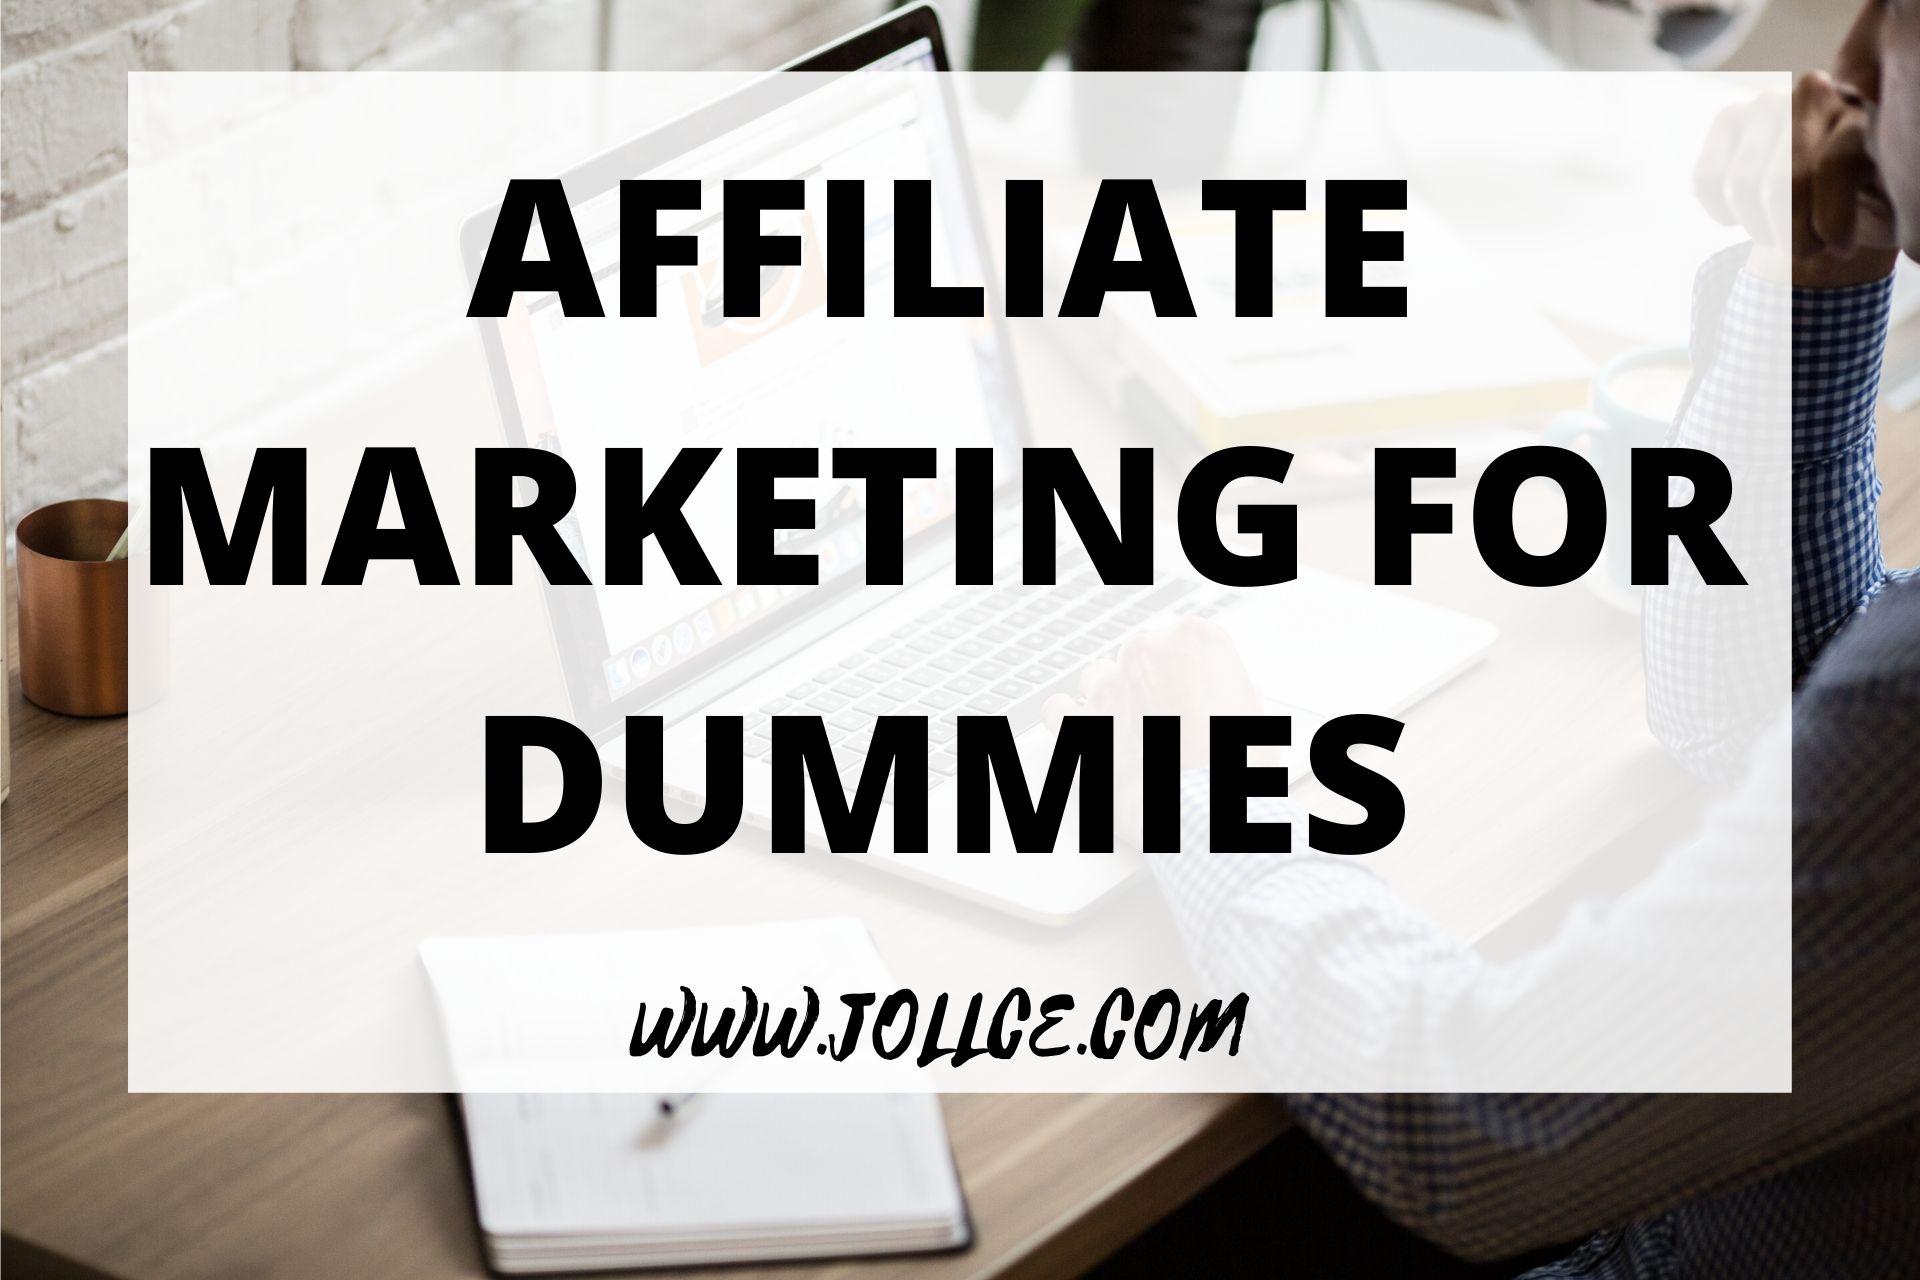 Affiliate Marketing For Dummies – Google Books   JOLLCE